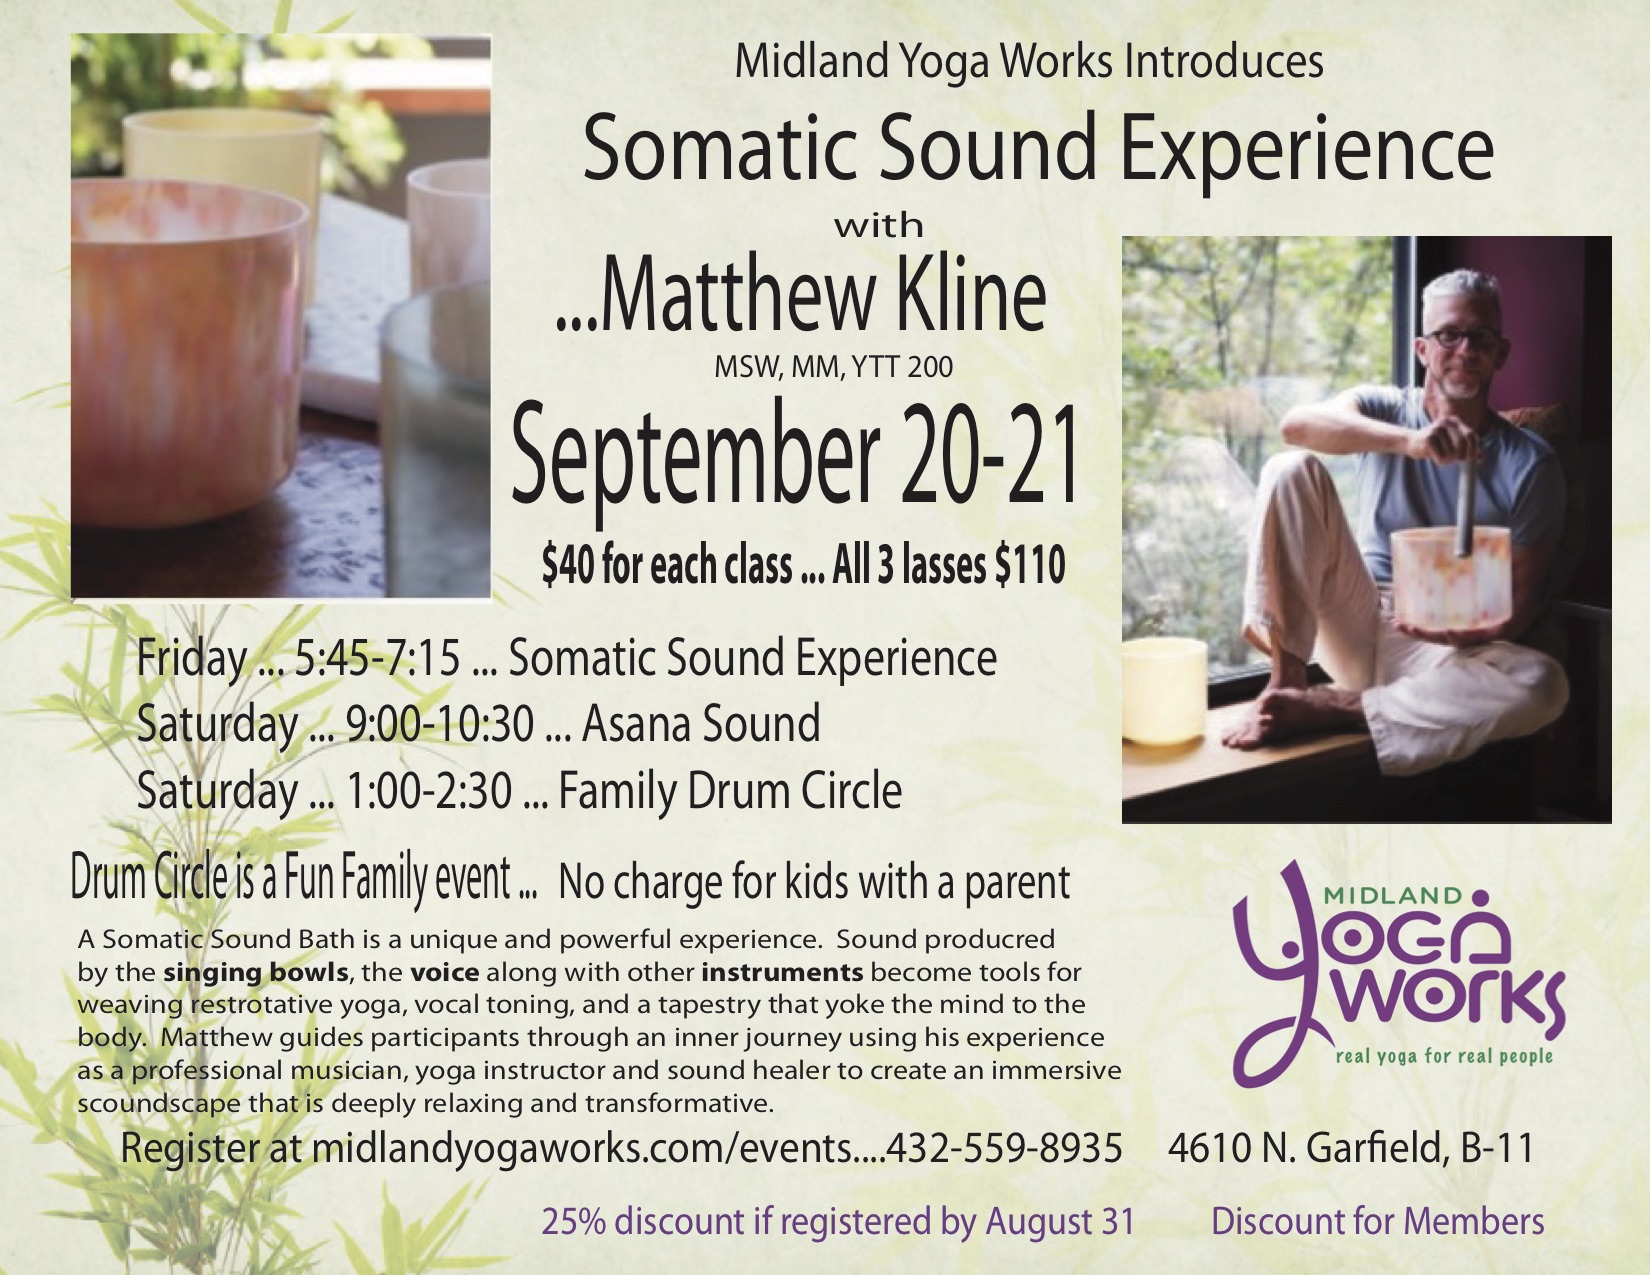 Matthew Kline sound bath copy.jpg